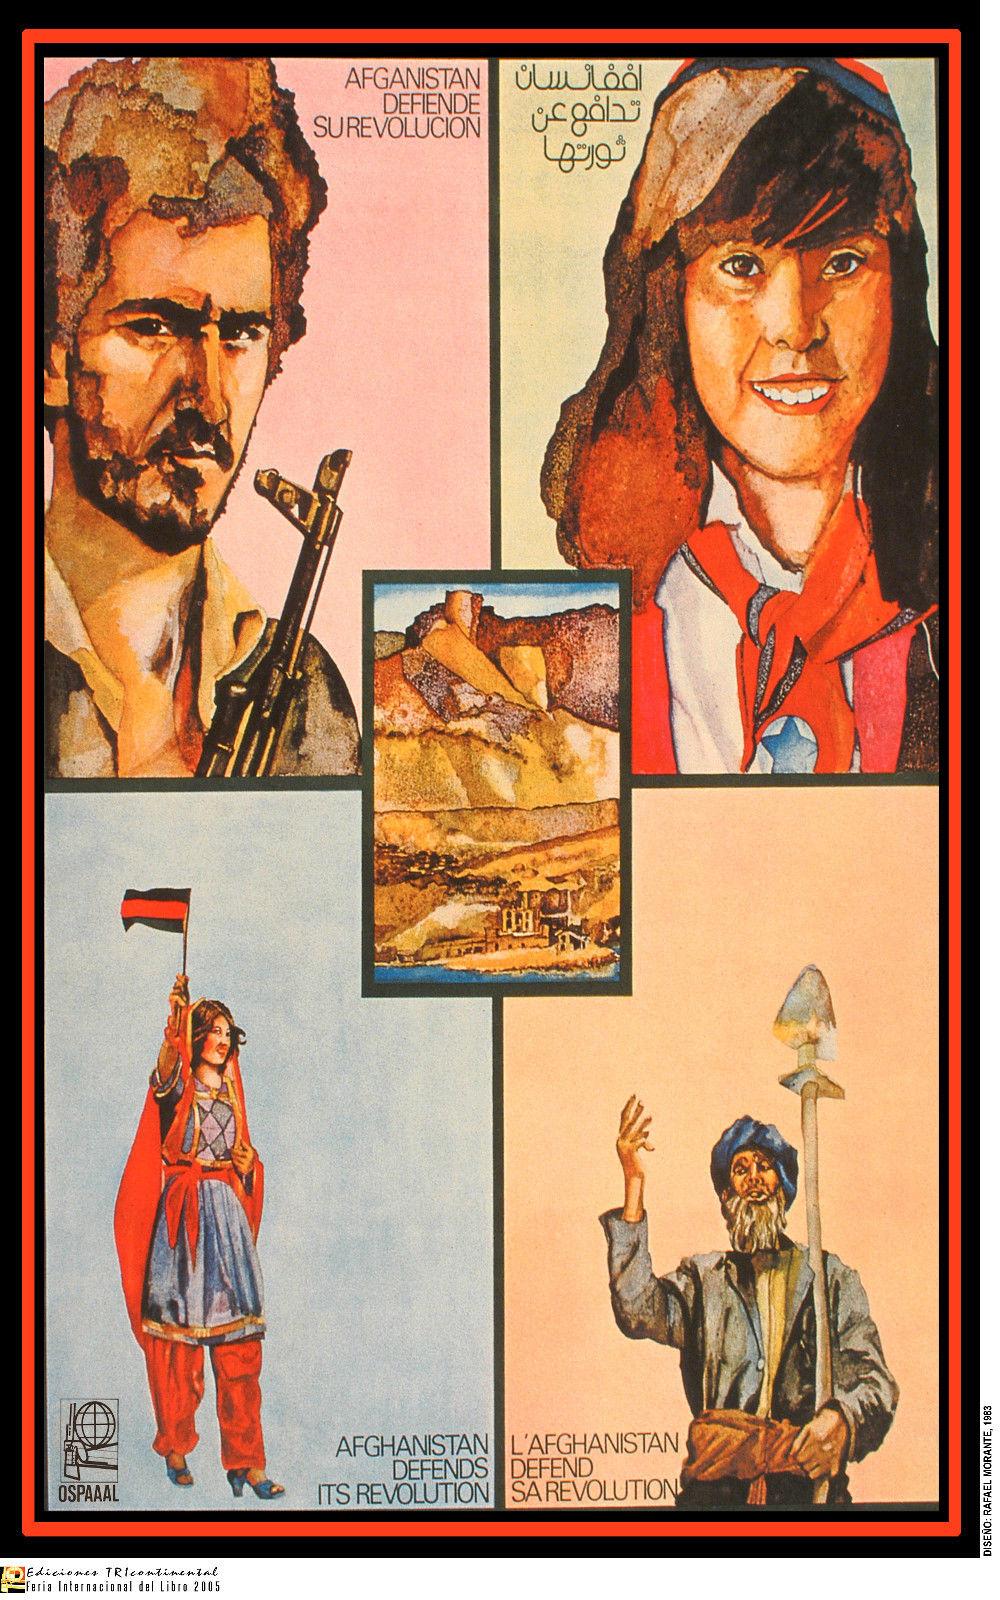 OSPAAAL Political Poster Afghanistan Defends it/'s Revolution 1983 Art ORIGINAL